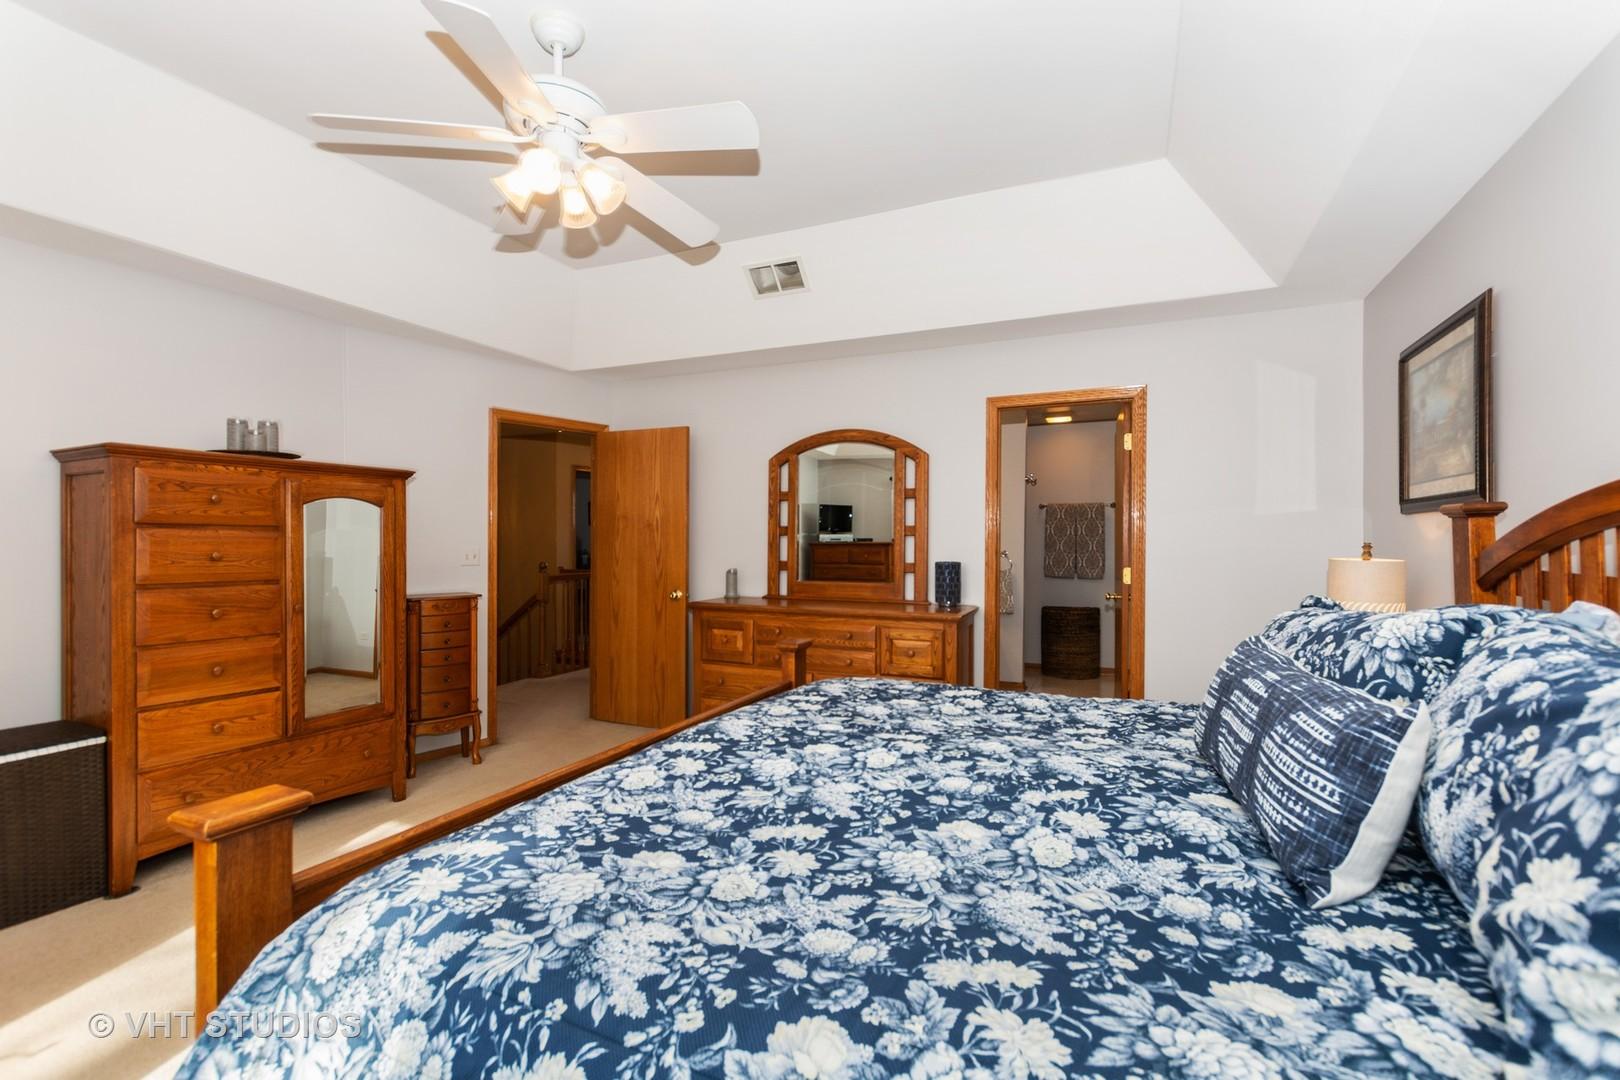 12520 South Melvina, Palos Heights, Illinois, 60463